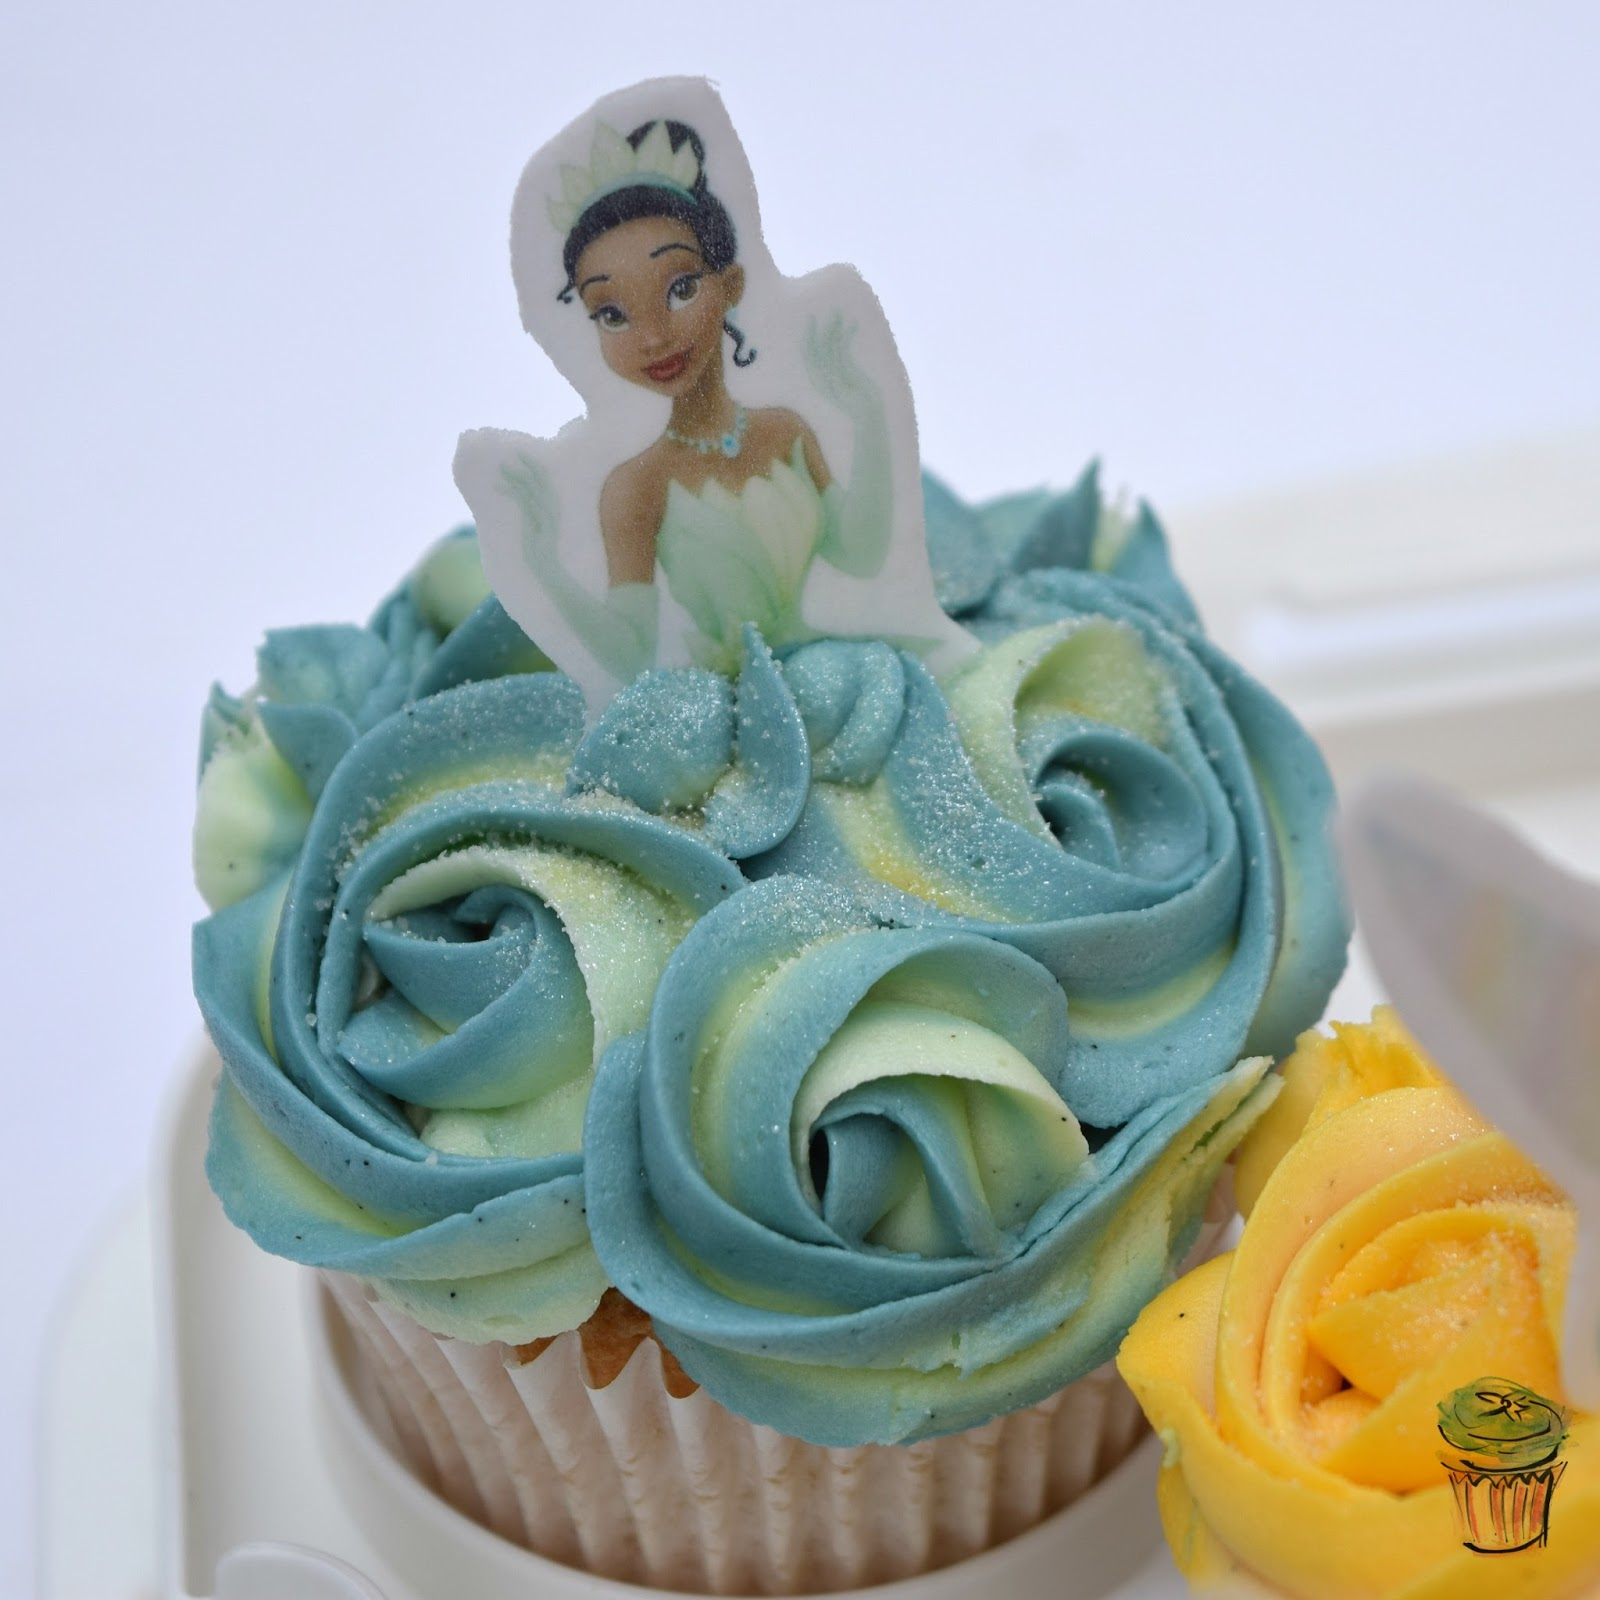 Princess and The Frog Disney Princess Cupcake Ombre Icing